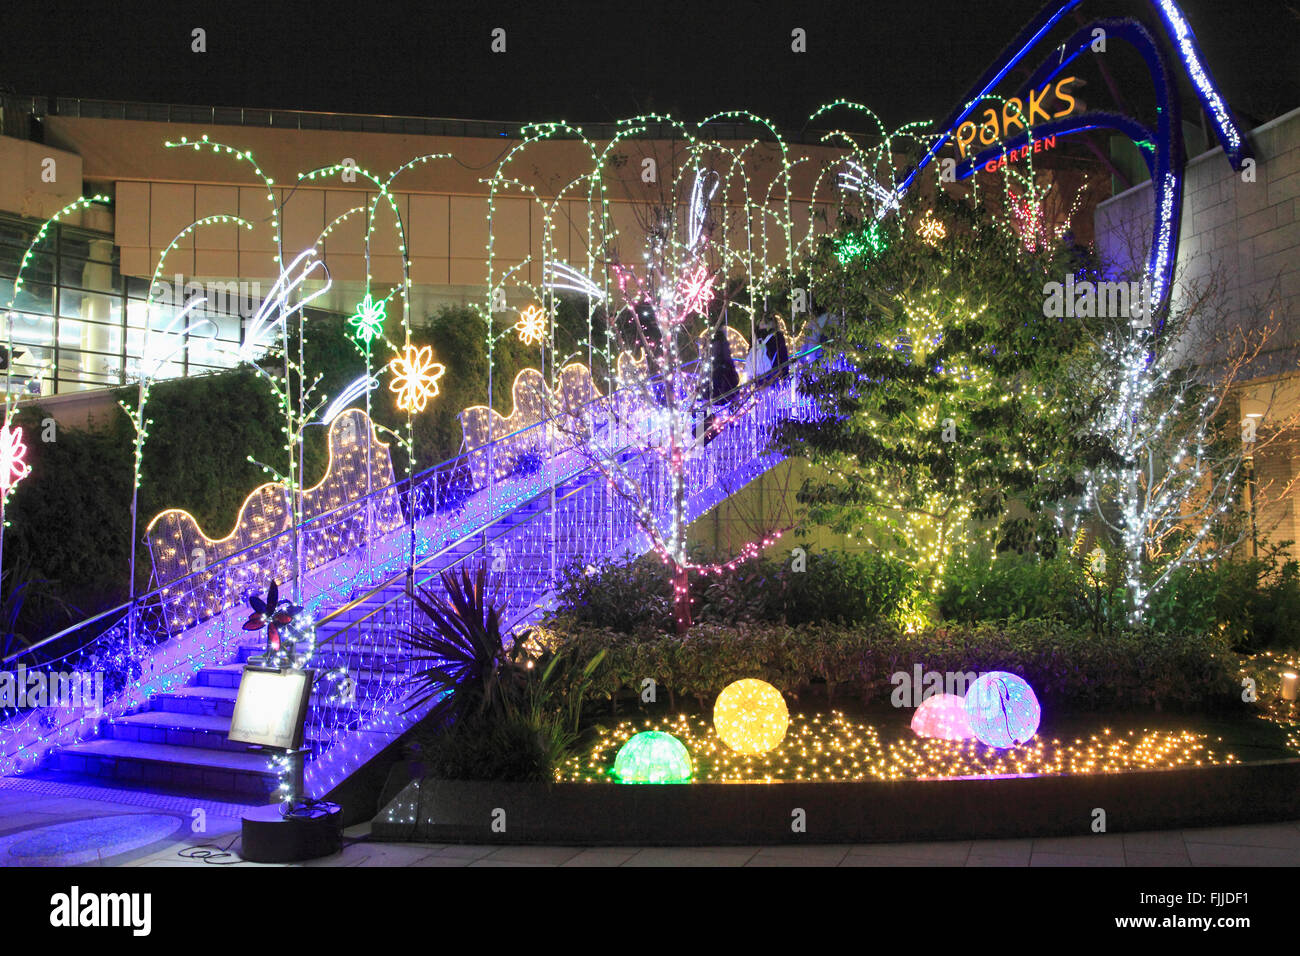 Japan, Osaka, Namba Parks, Nacht, Beleuchtung, Stockbild